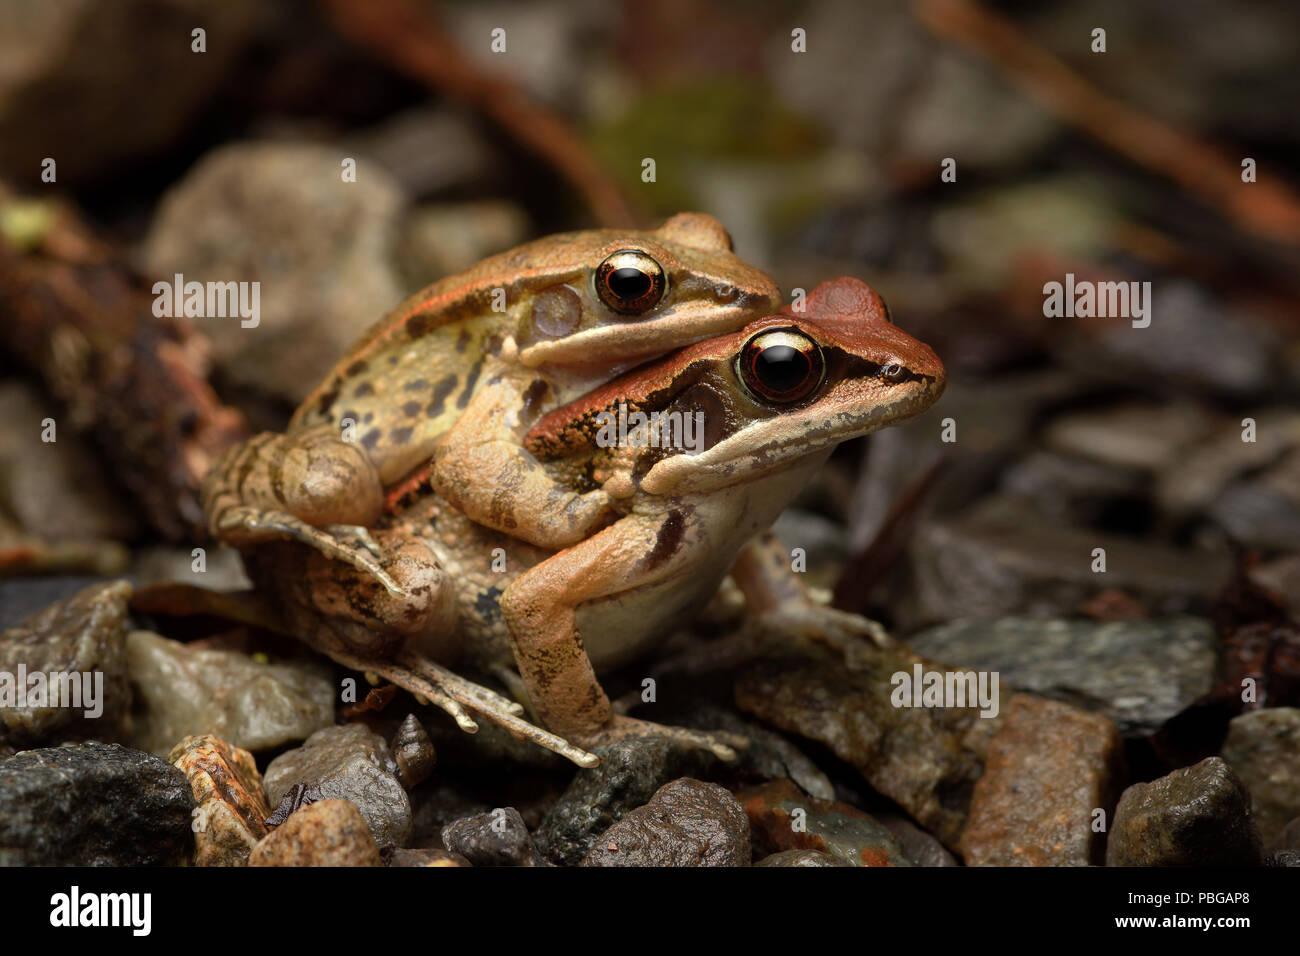 Hylarana latouchii brown wood frog - Stock Image